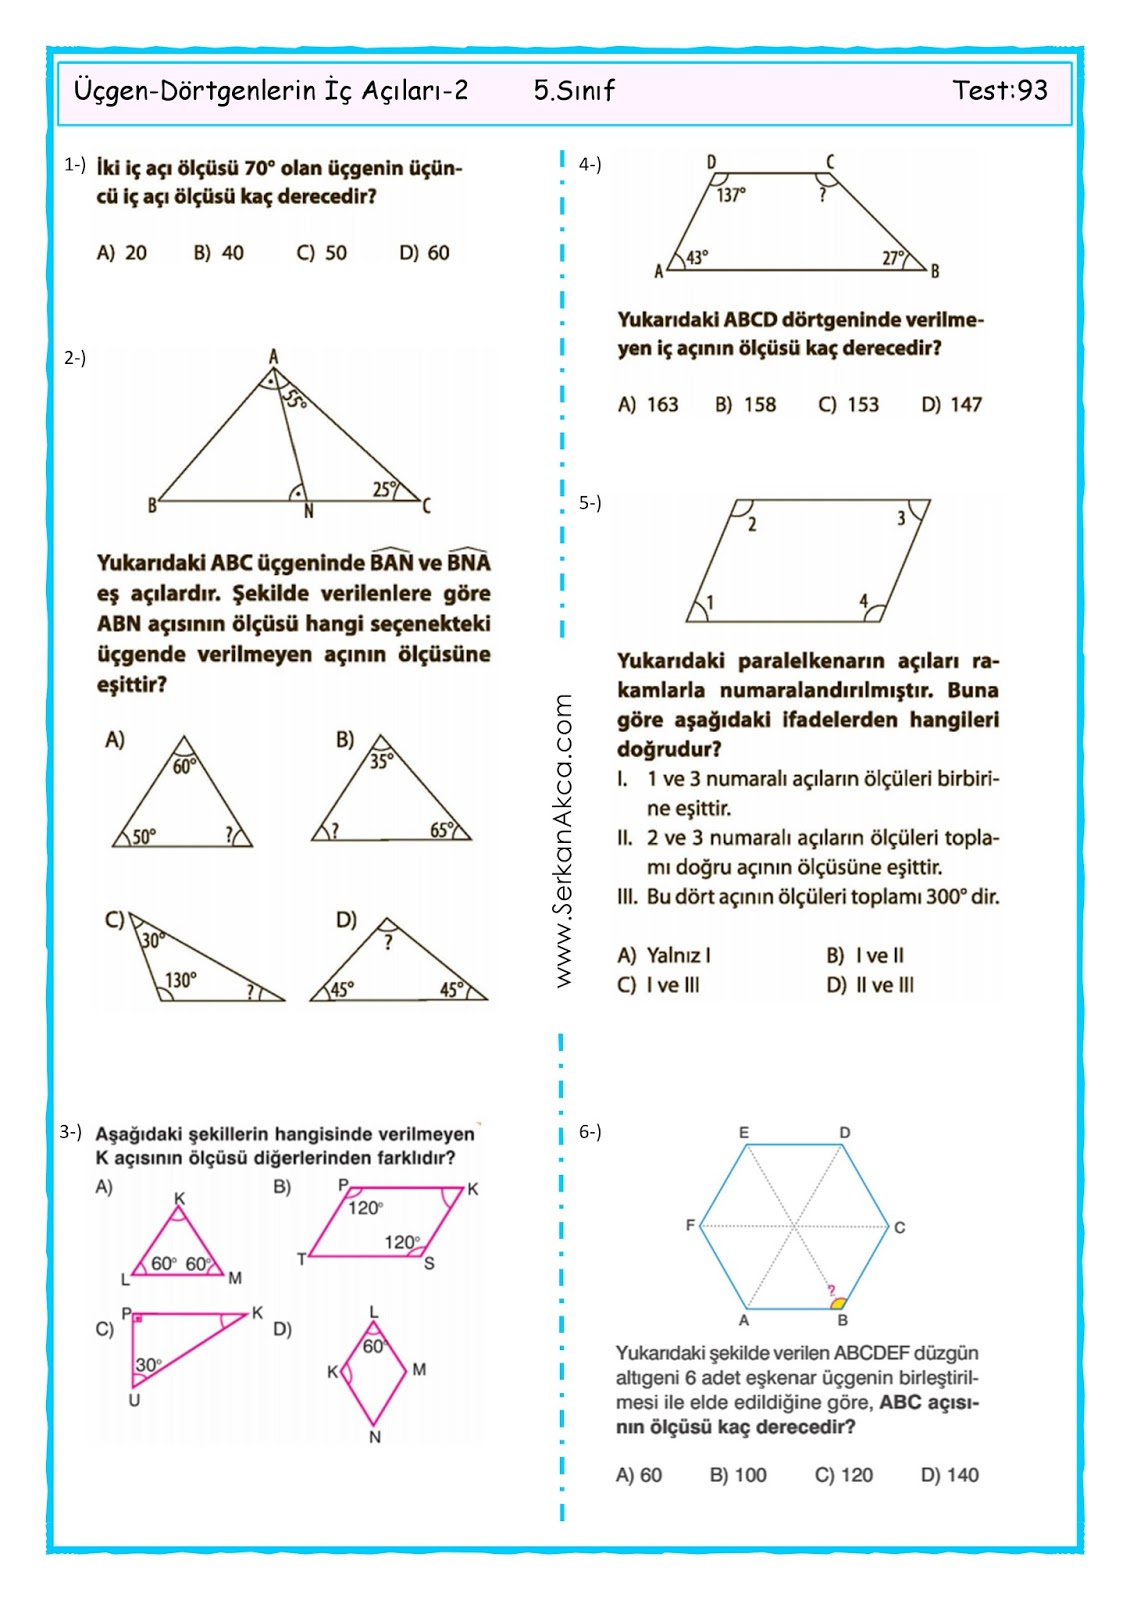 5 Sinif Ucgen Dortgenlerin Ic Acilar Toplami 2 Serkan Akca Matematik